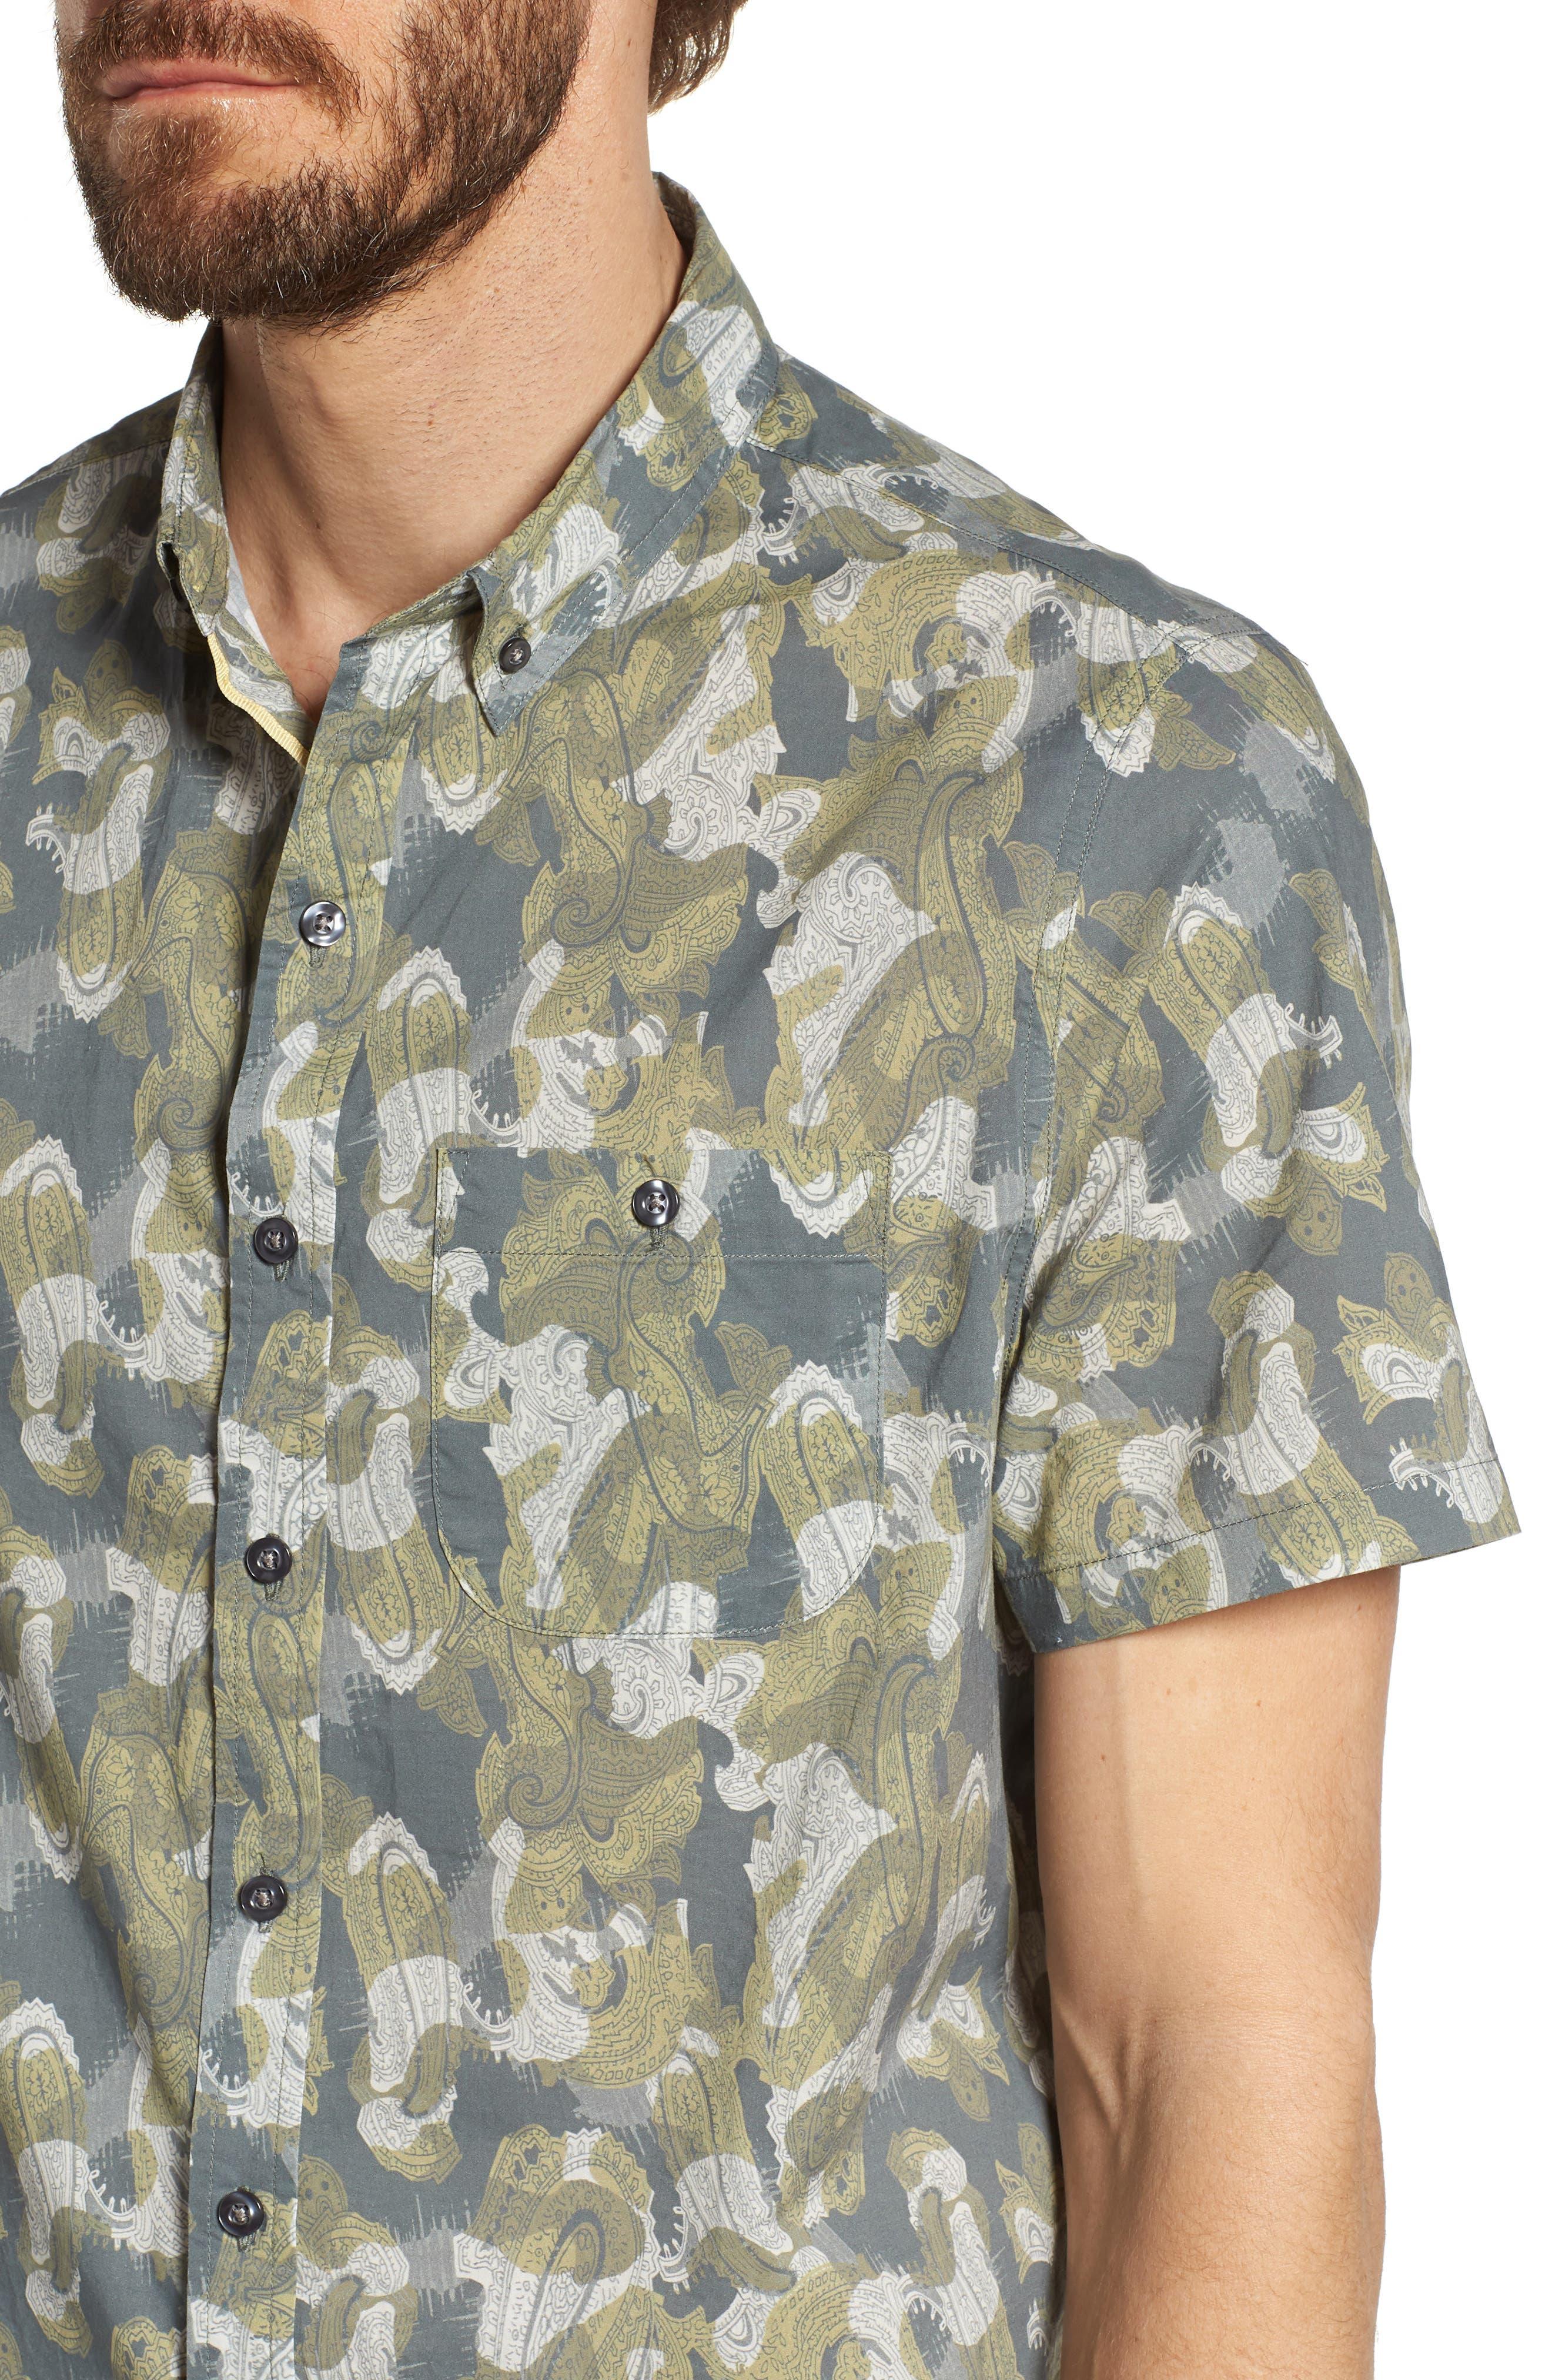 Paisley Print Short Sleeve Sport Shirt,                             Alternate thumbnail 4, color,                             Seahorse Paisley Print